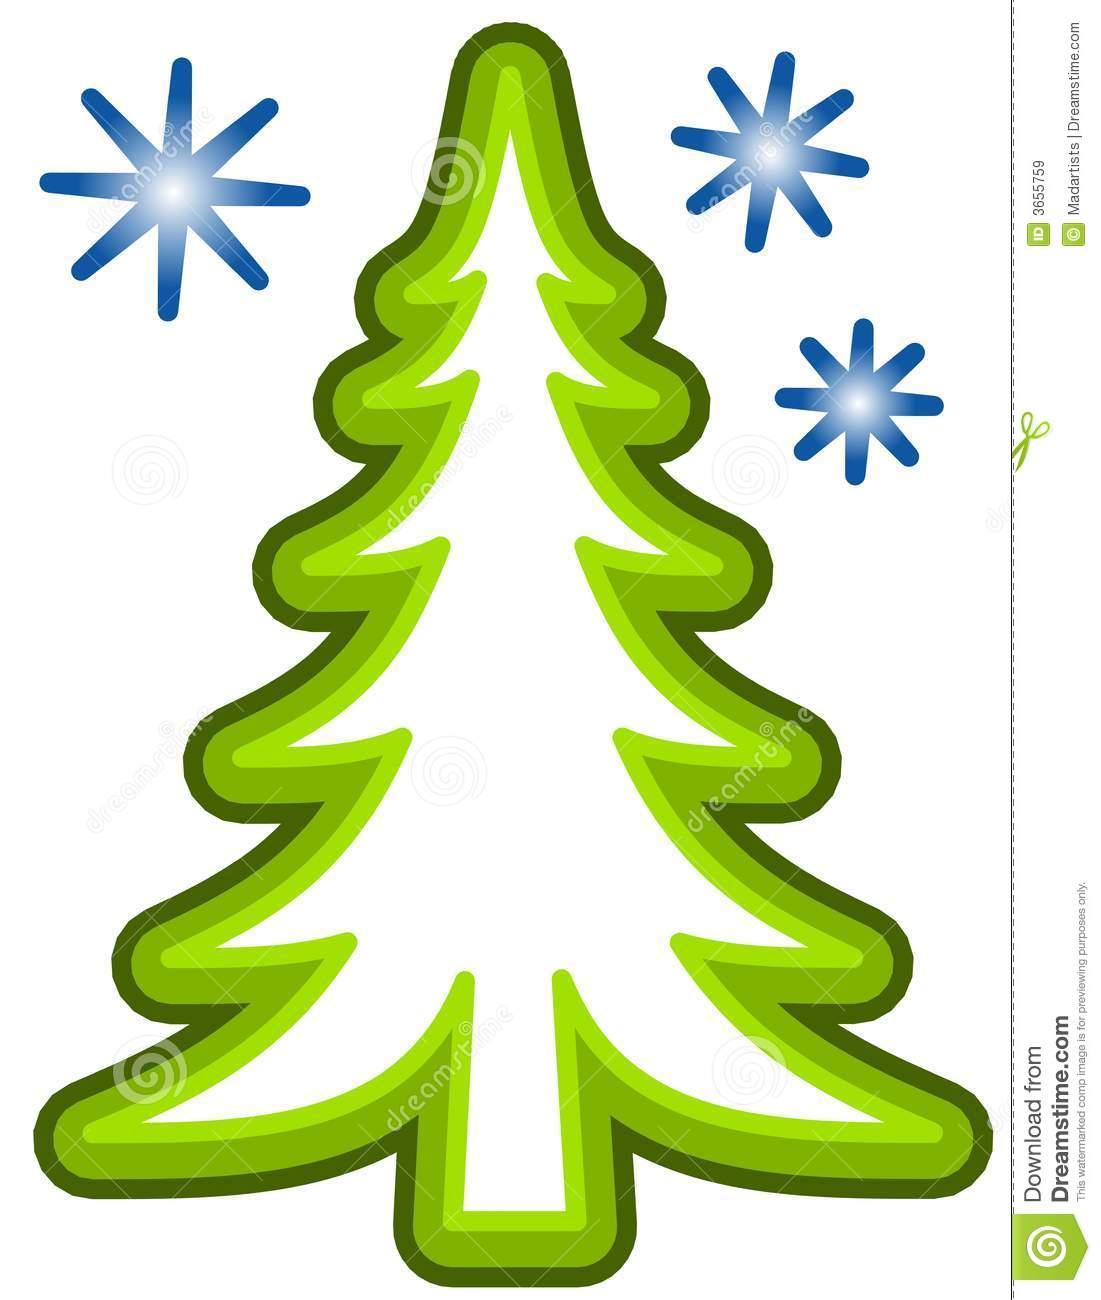 1101x1300 Xmas Snowflake Clipart, Explore Pictures